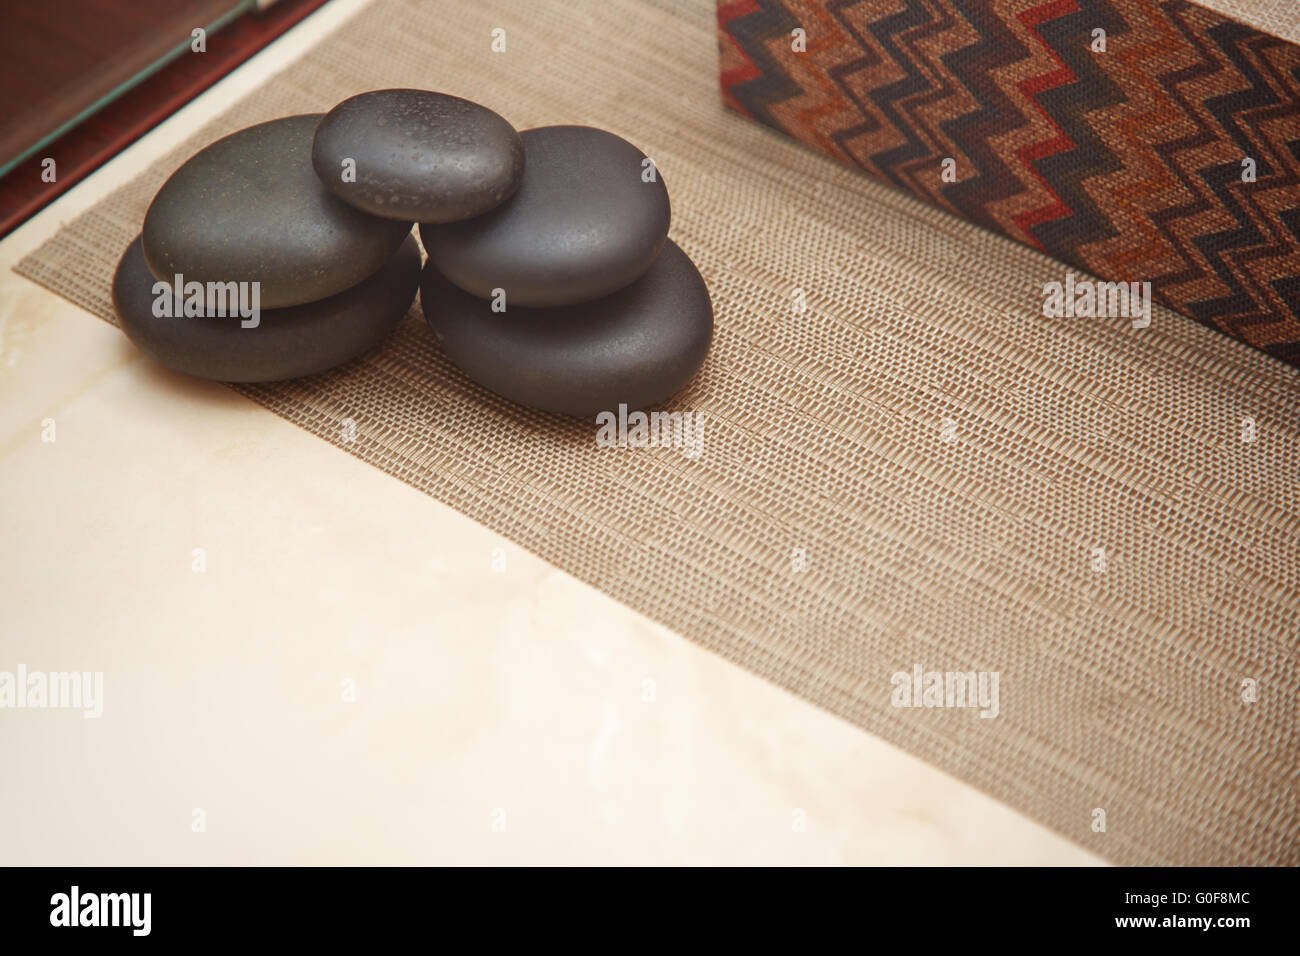 Stones for spa procedure - Stock Image